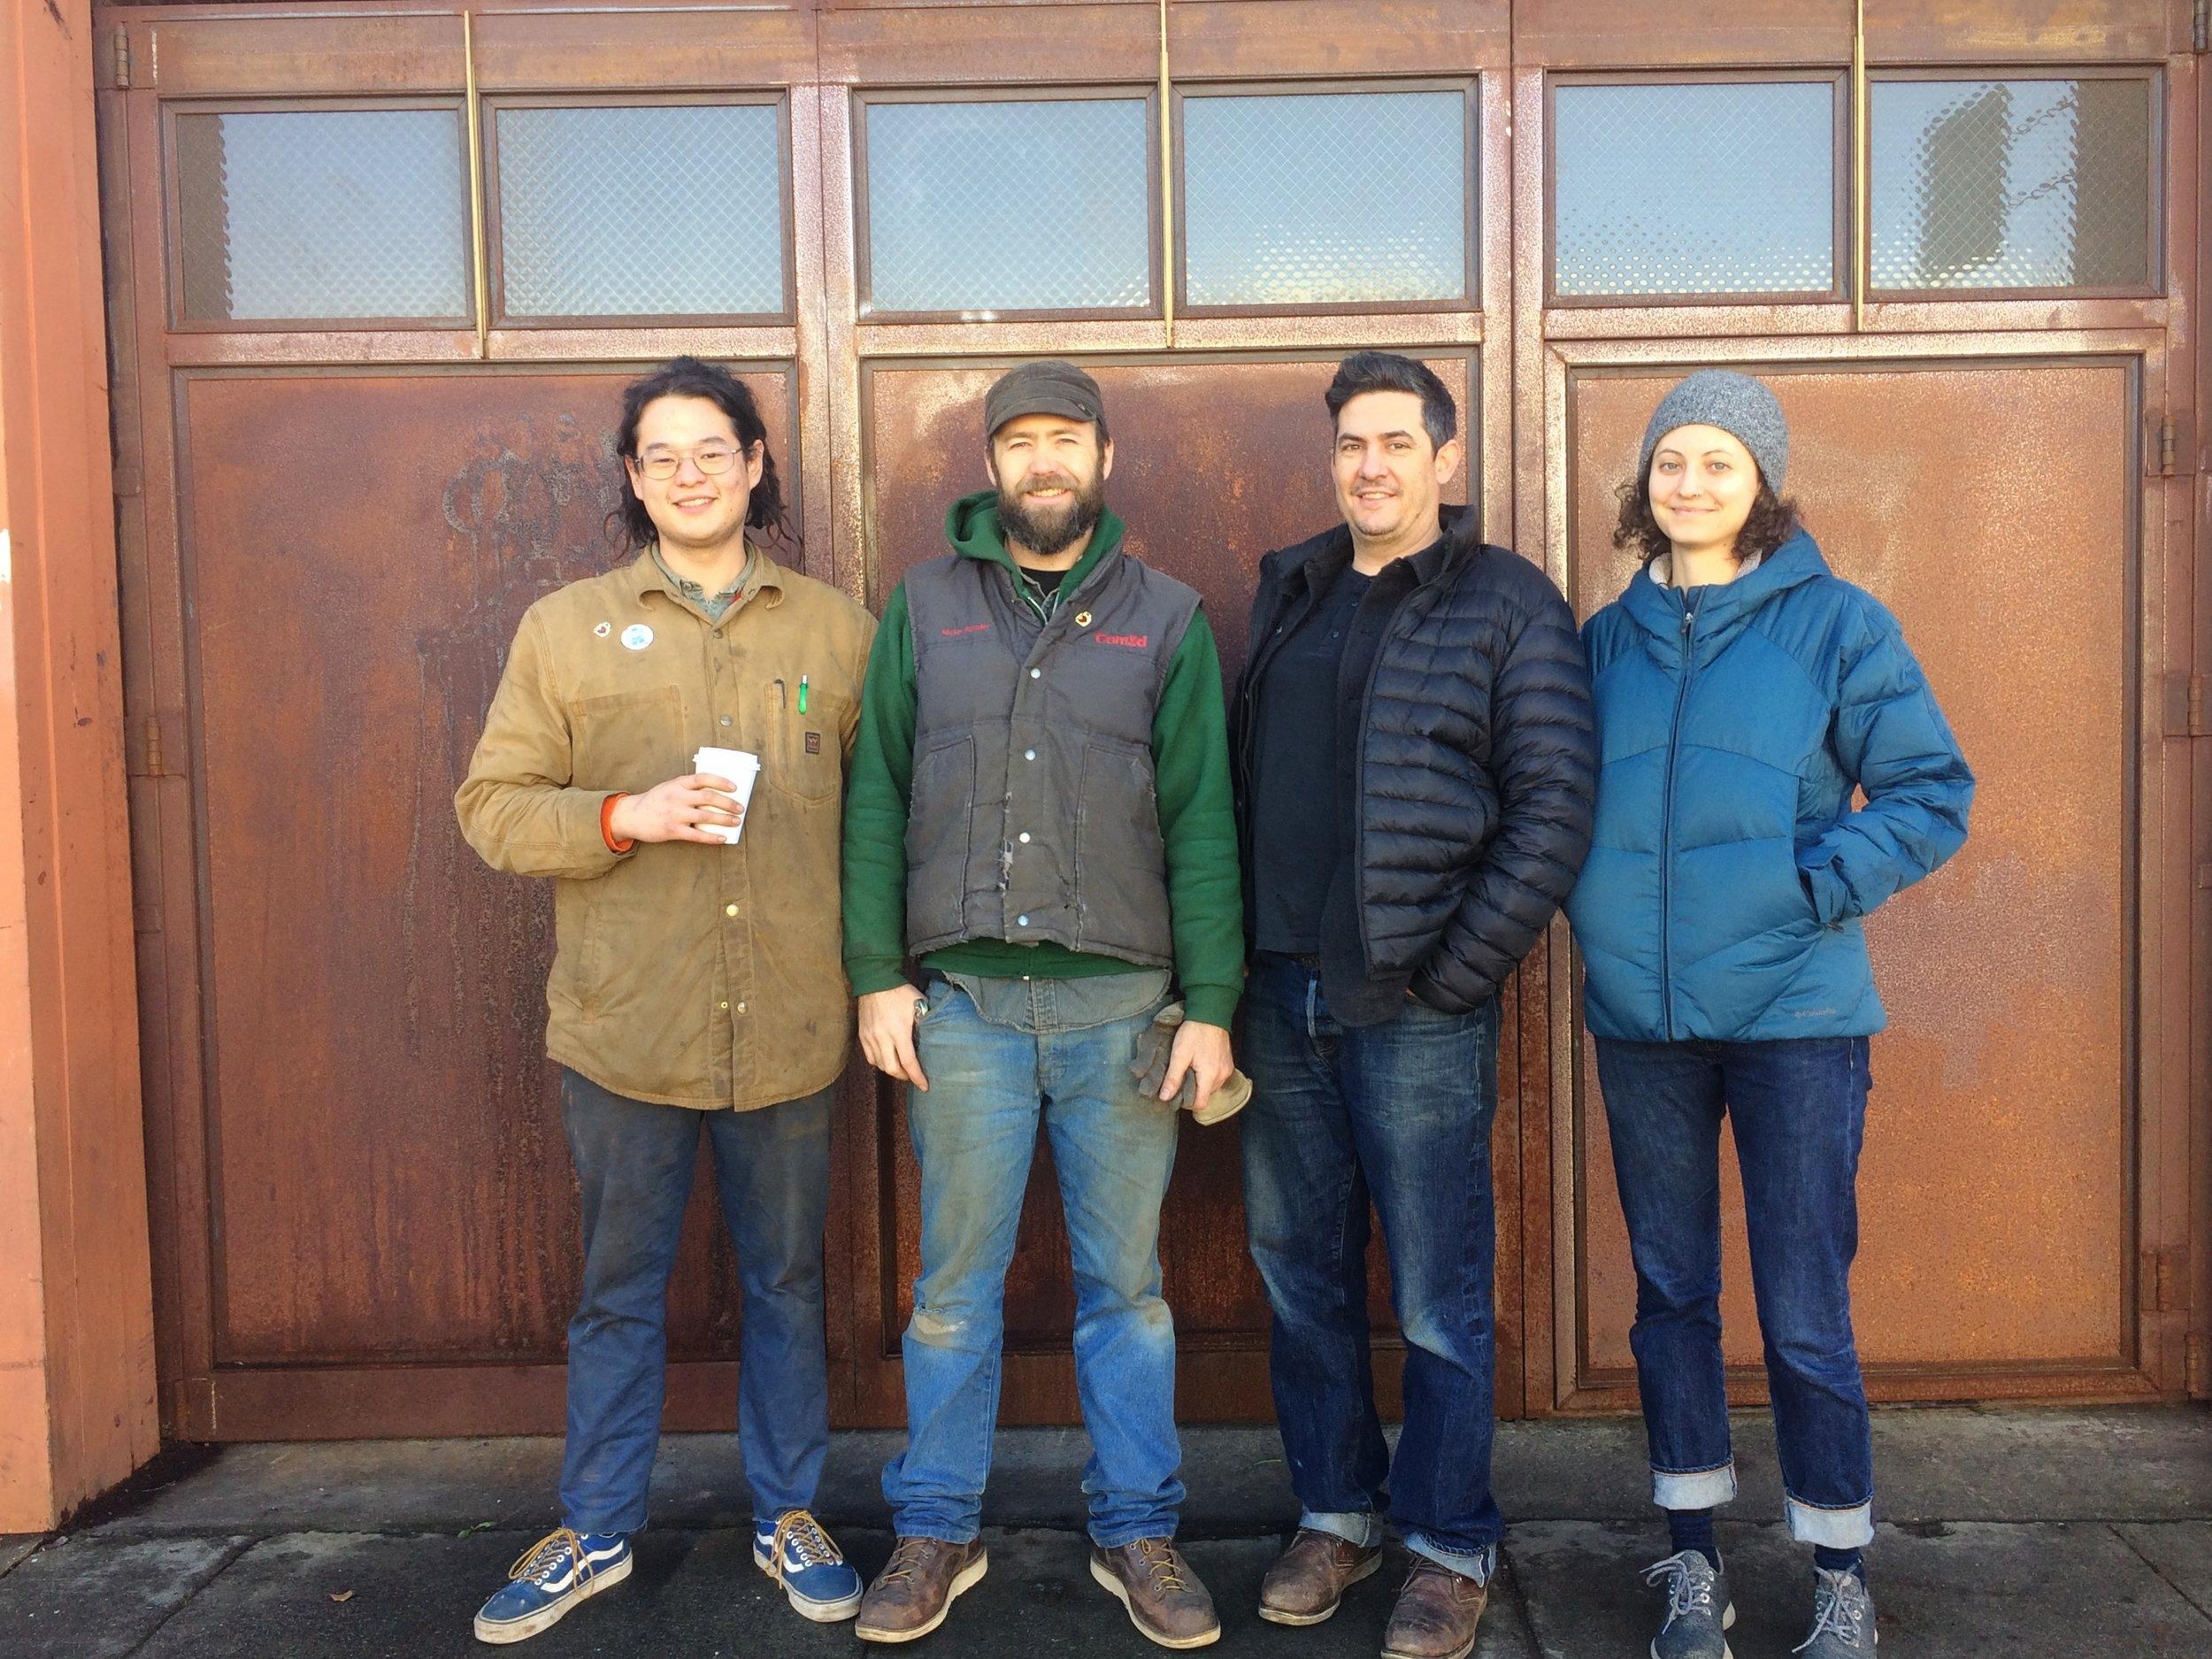 OAS Team (left to right) - Michale Sue, Shane Lindsay, Luigi Oldani, and Hannah Fariss  .